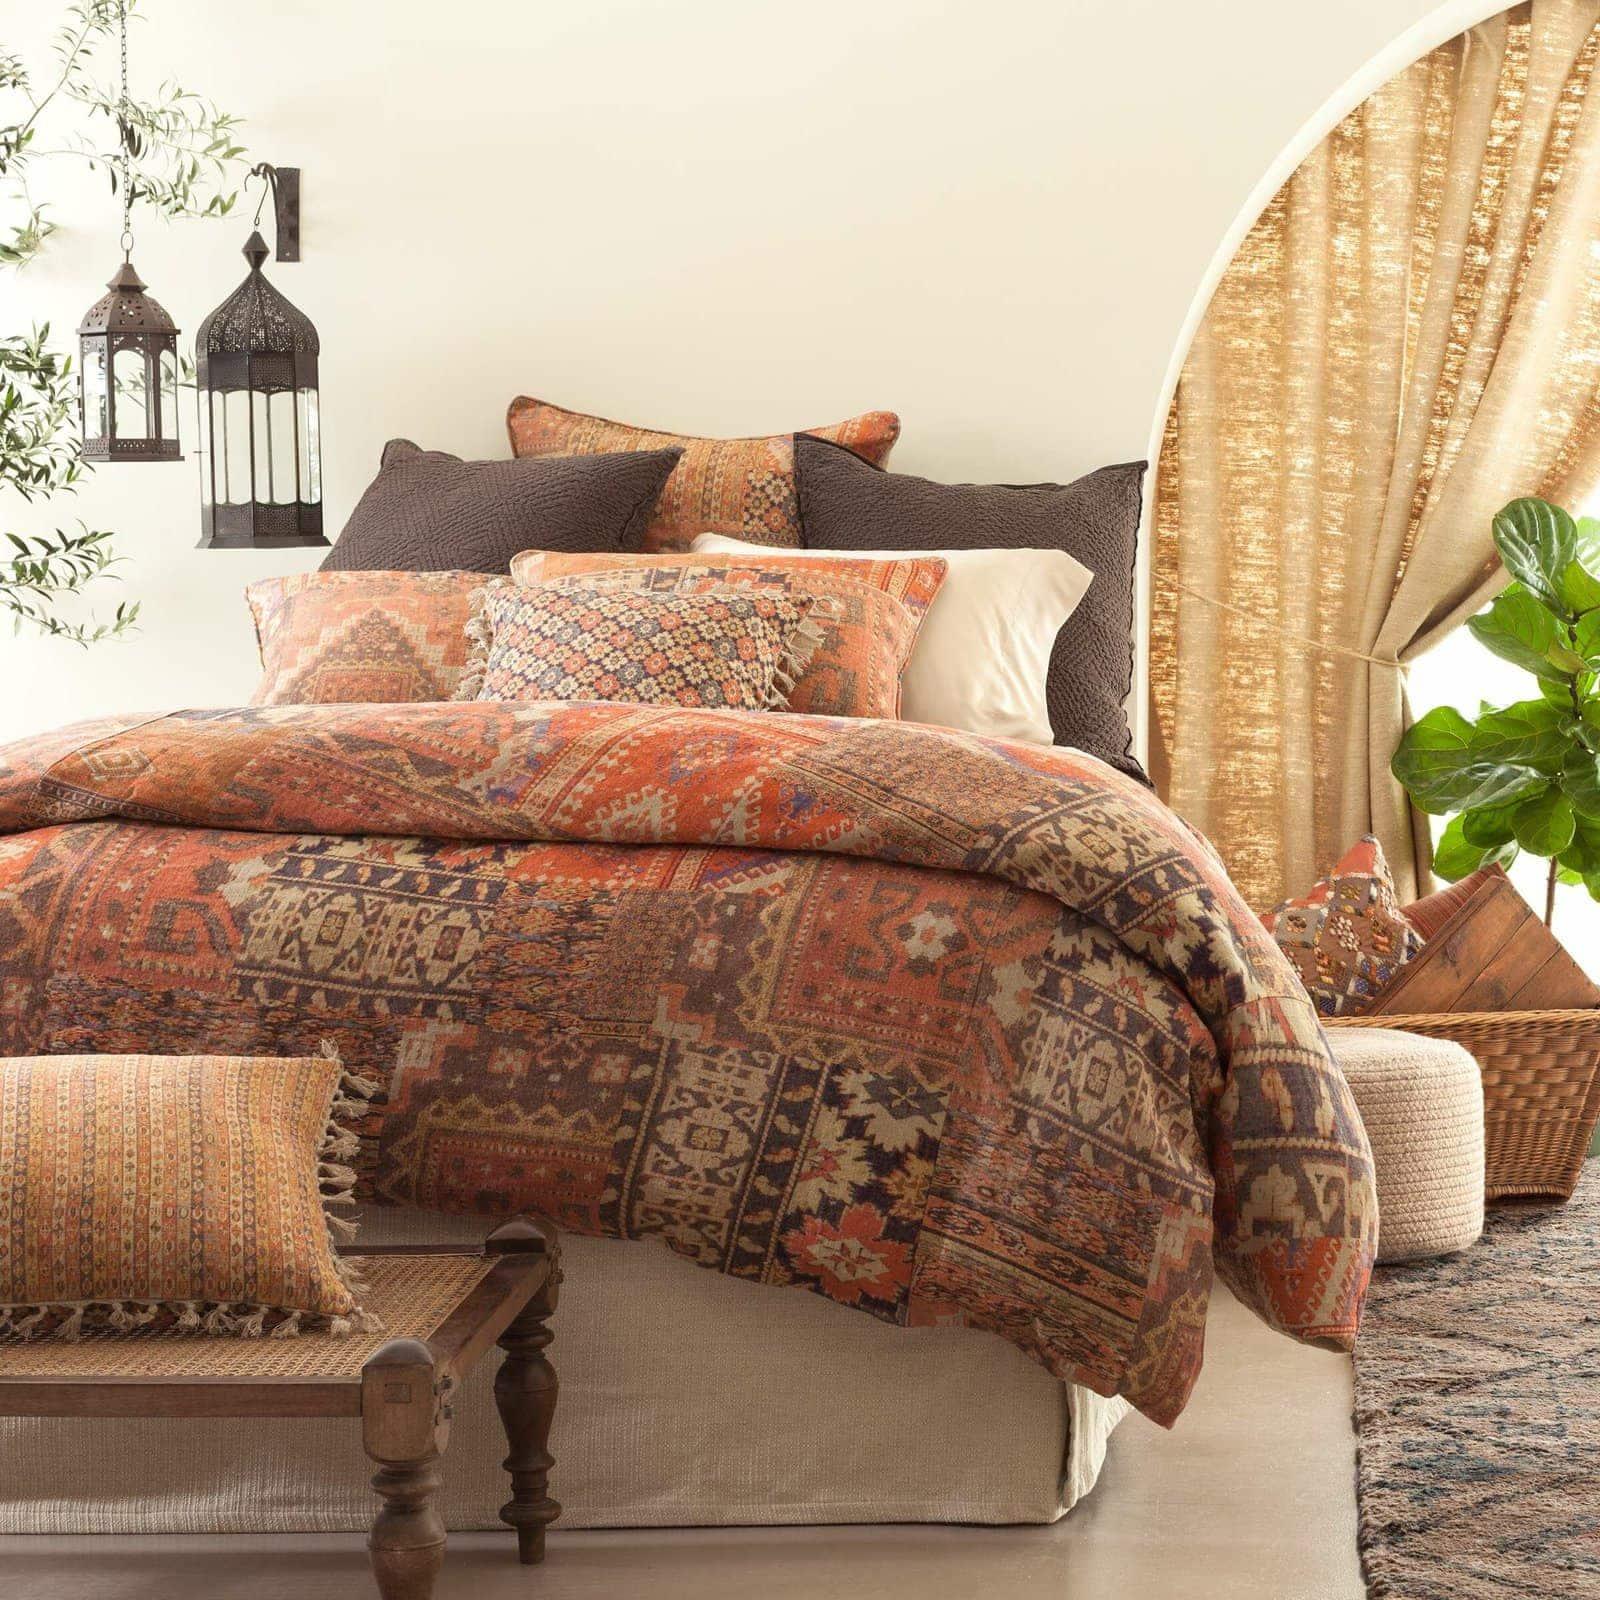 Kilim Inspired Patchwork Linen Bedding